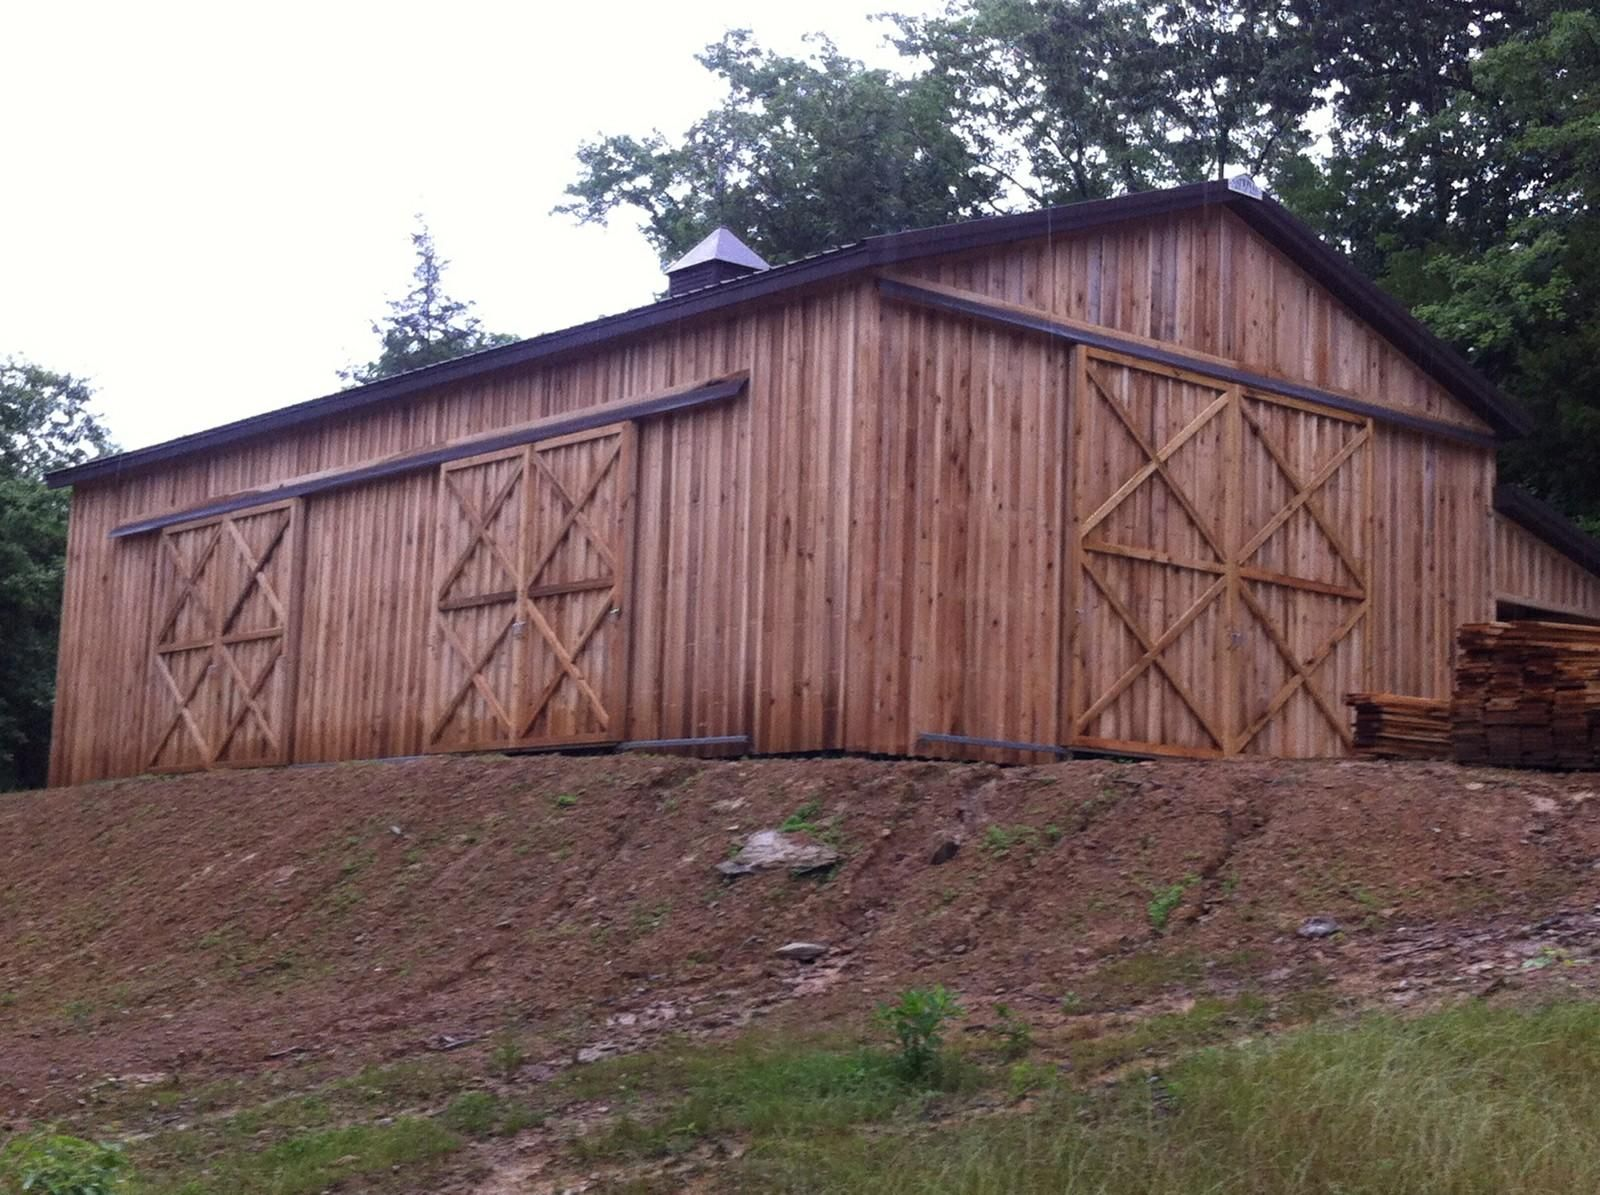 30x50x14 barn with 10x50 shed poplar siding www nationalbarn com